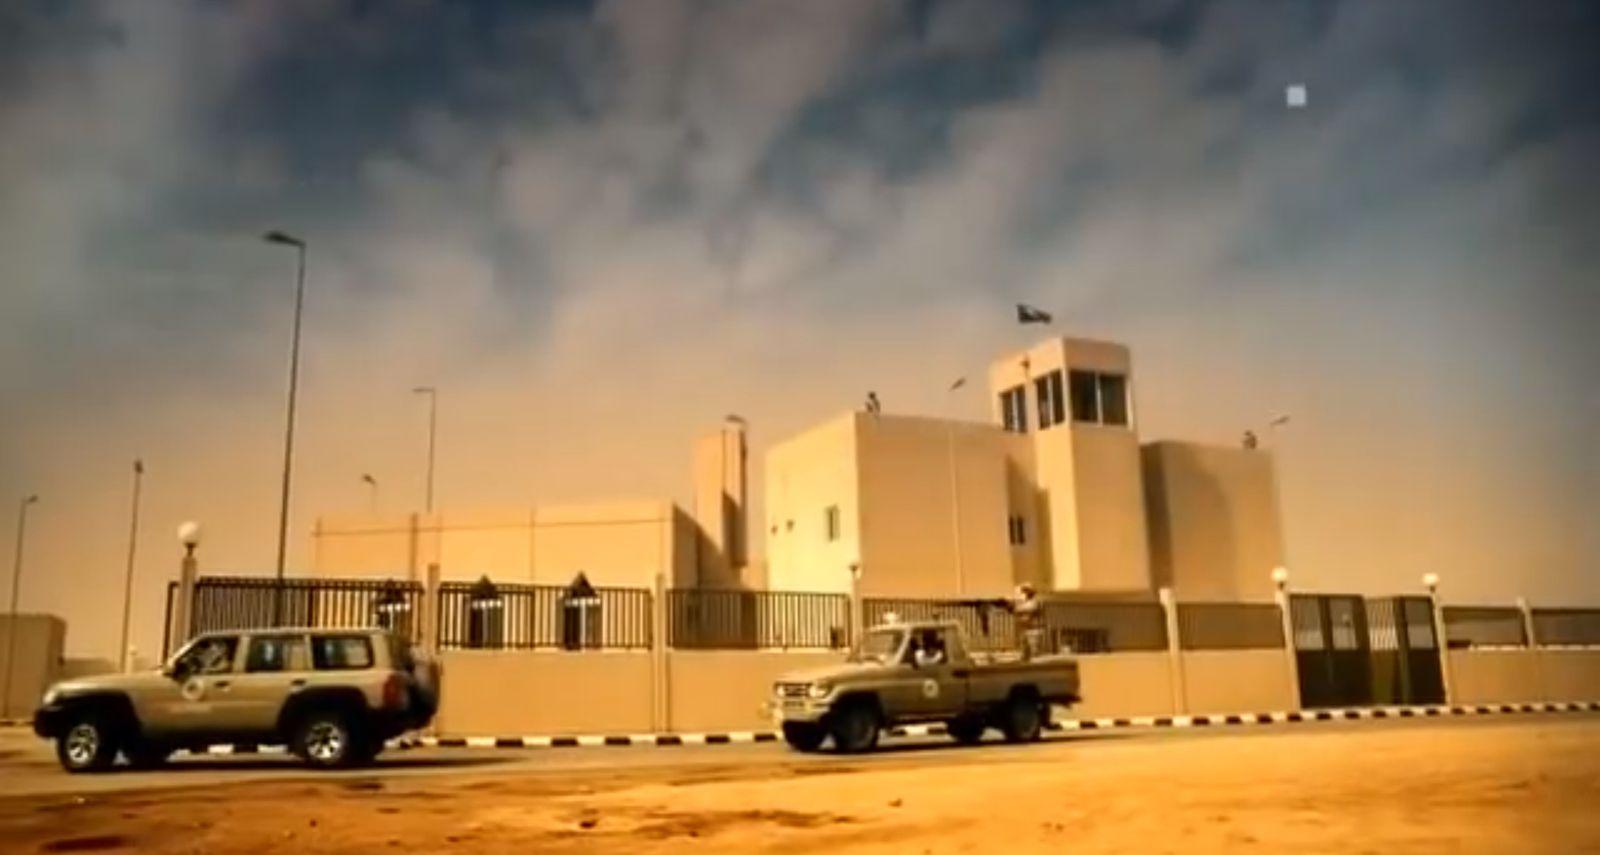 EINMALIGE VERWENDUNG NUR ALS ZITAT Screenshot/ Grenze/ Irak/ Saudi-Arabien